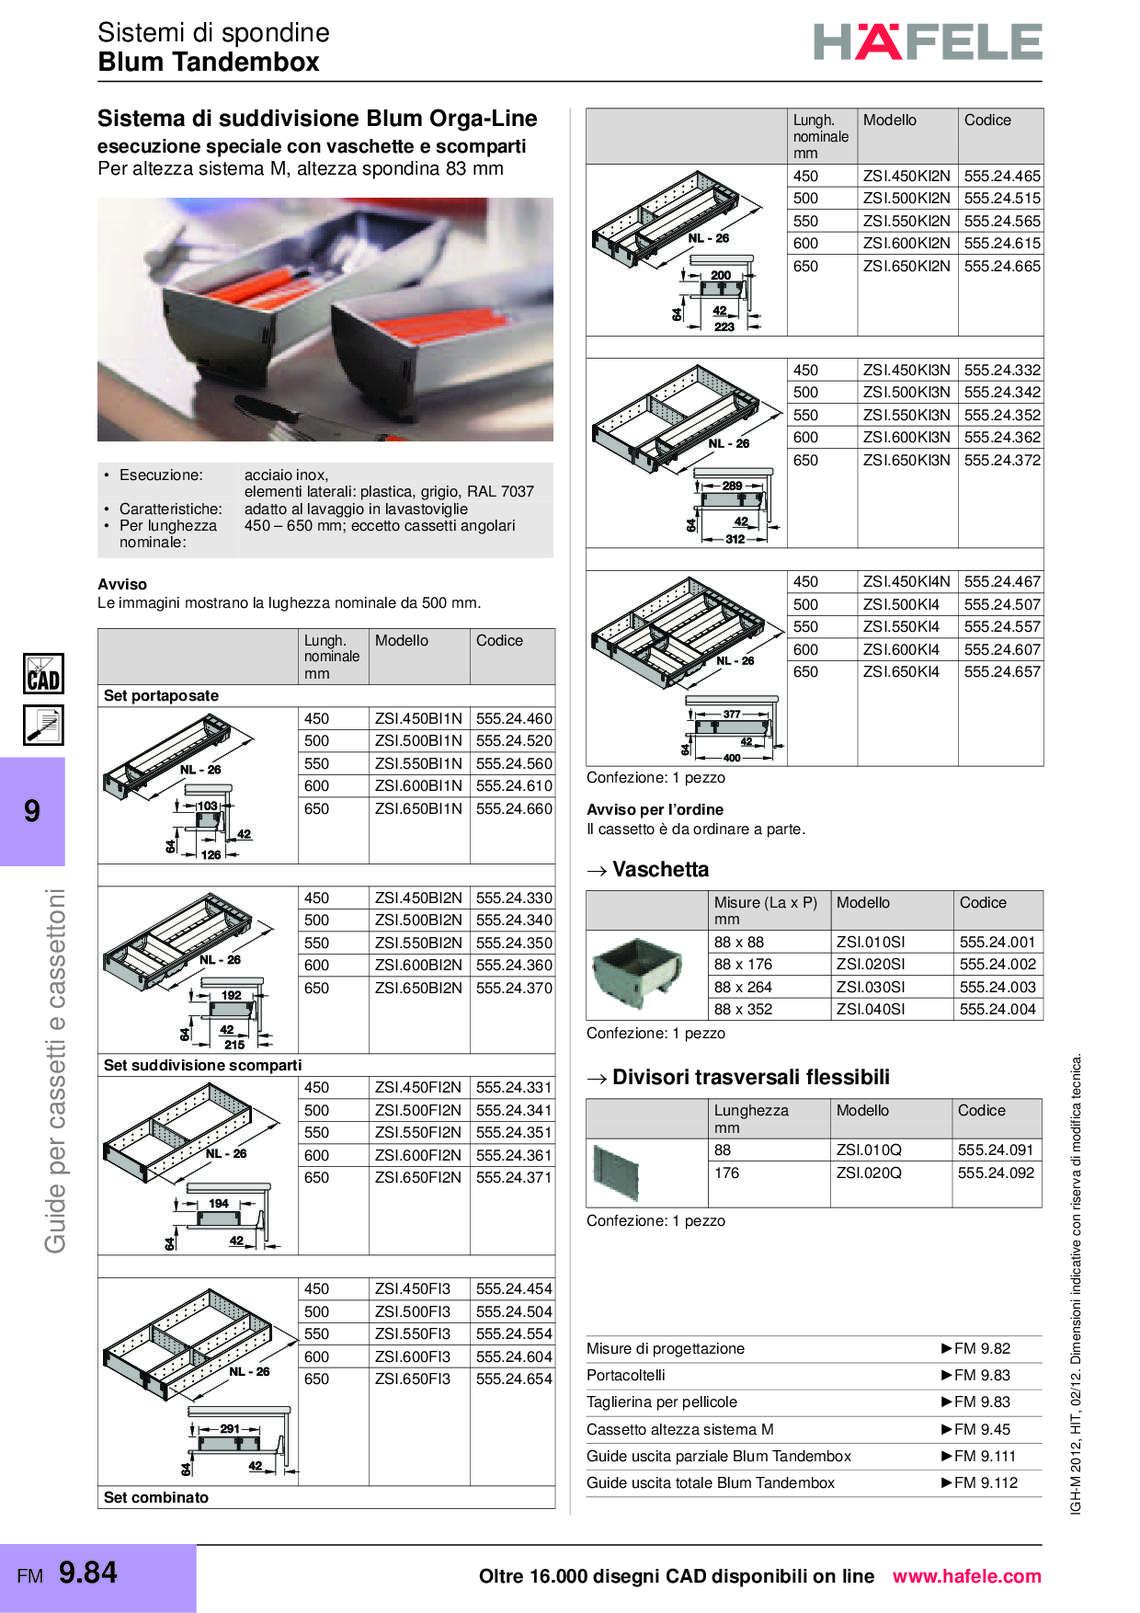 hafele-spondine-e-guide-per-mobili_40_107.jpg